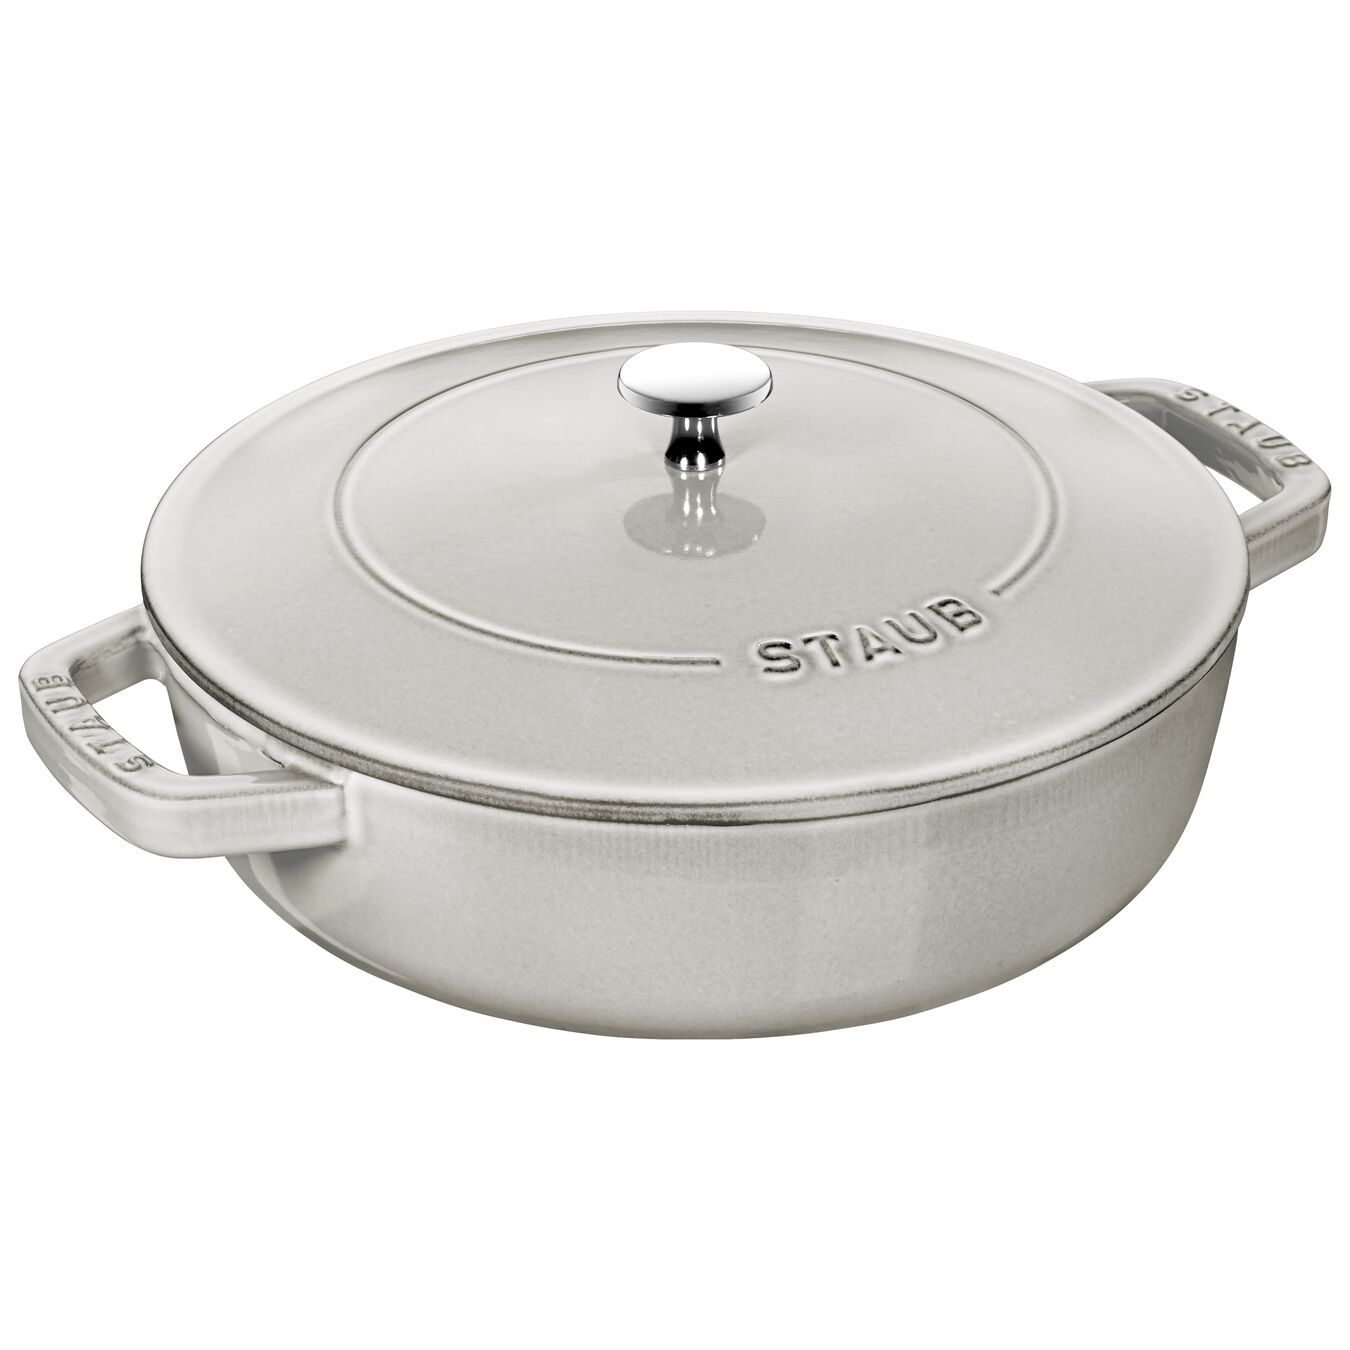 3,25 l Cast iron round Braisière, White Truffle,,large 1